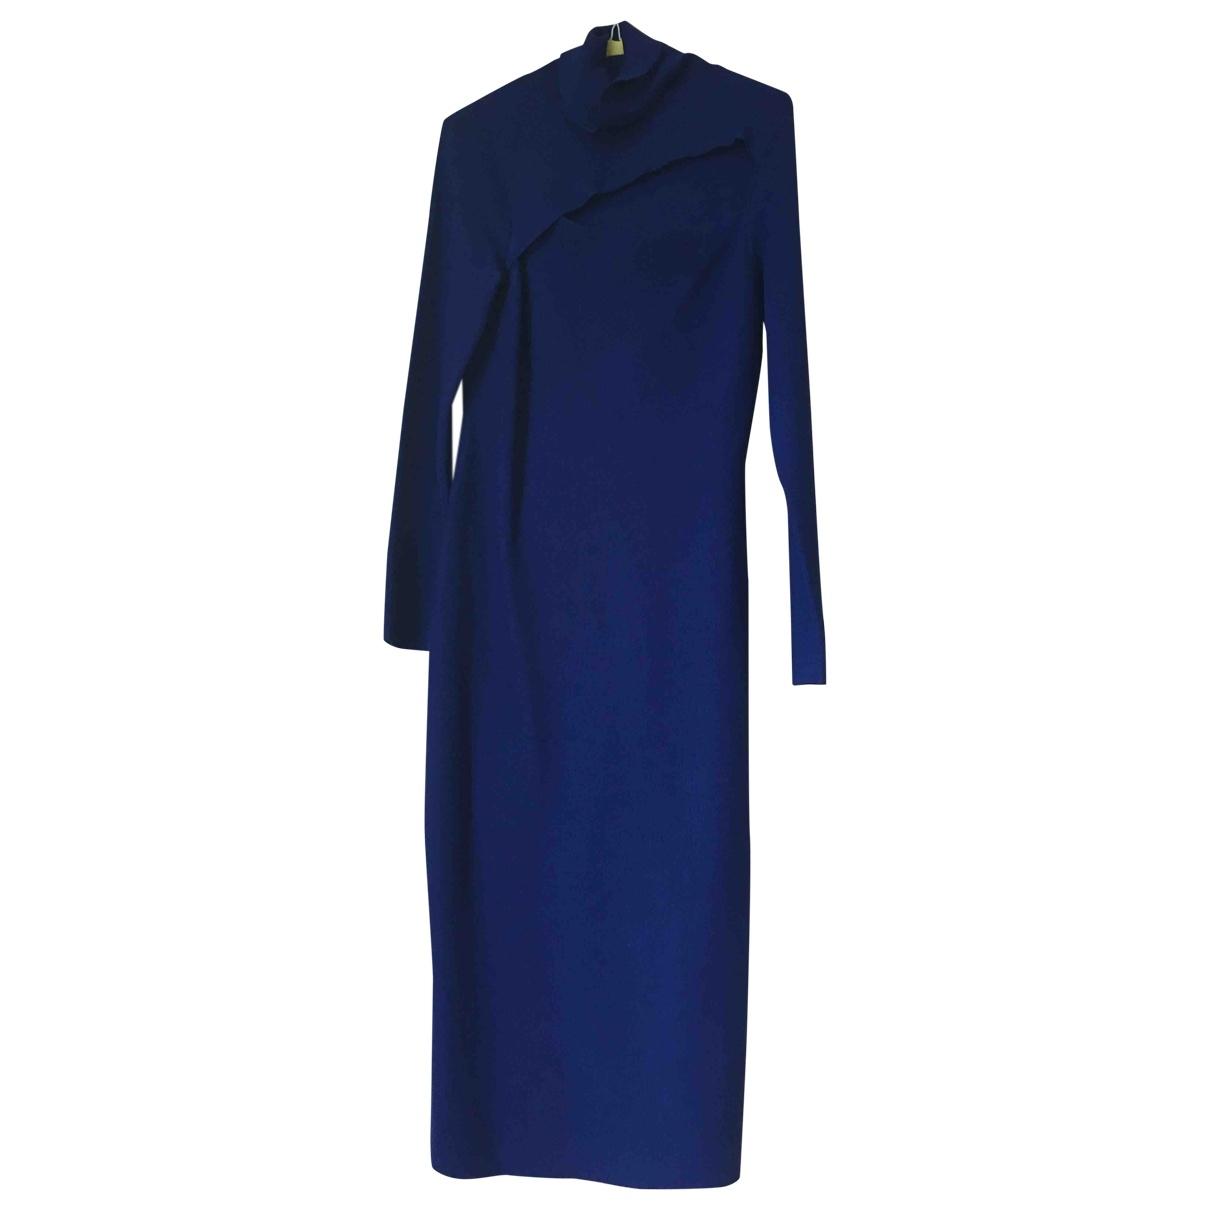 A.l.c \N Blue Wool dress for Women M